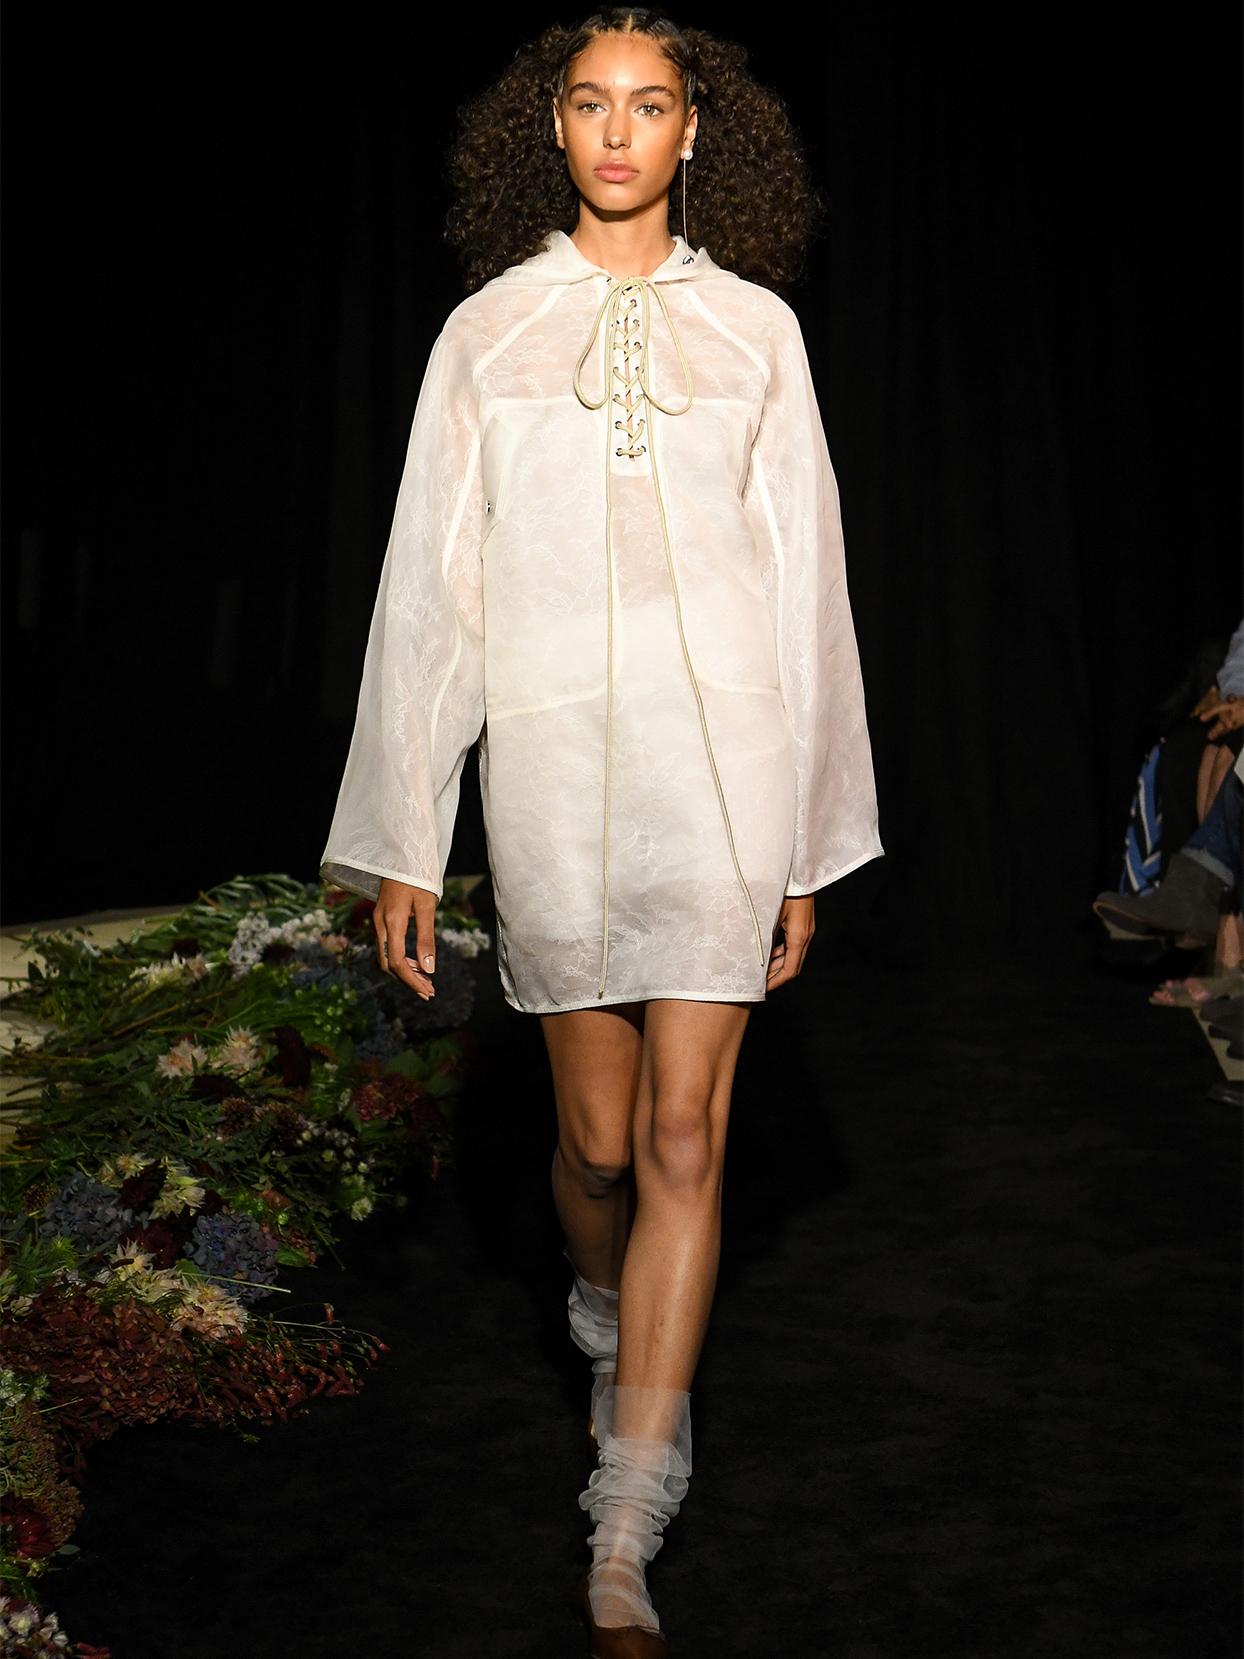 danielle frankel sheer jacket short wedding dress fall 2020